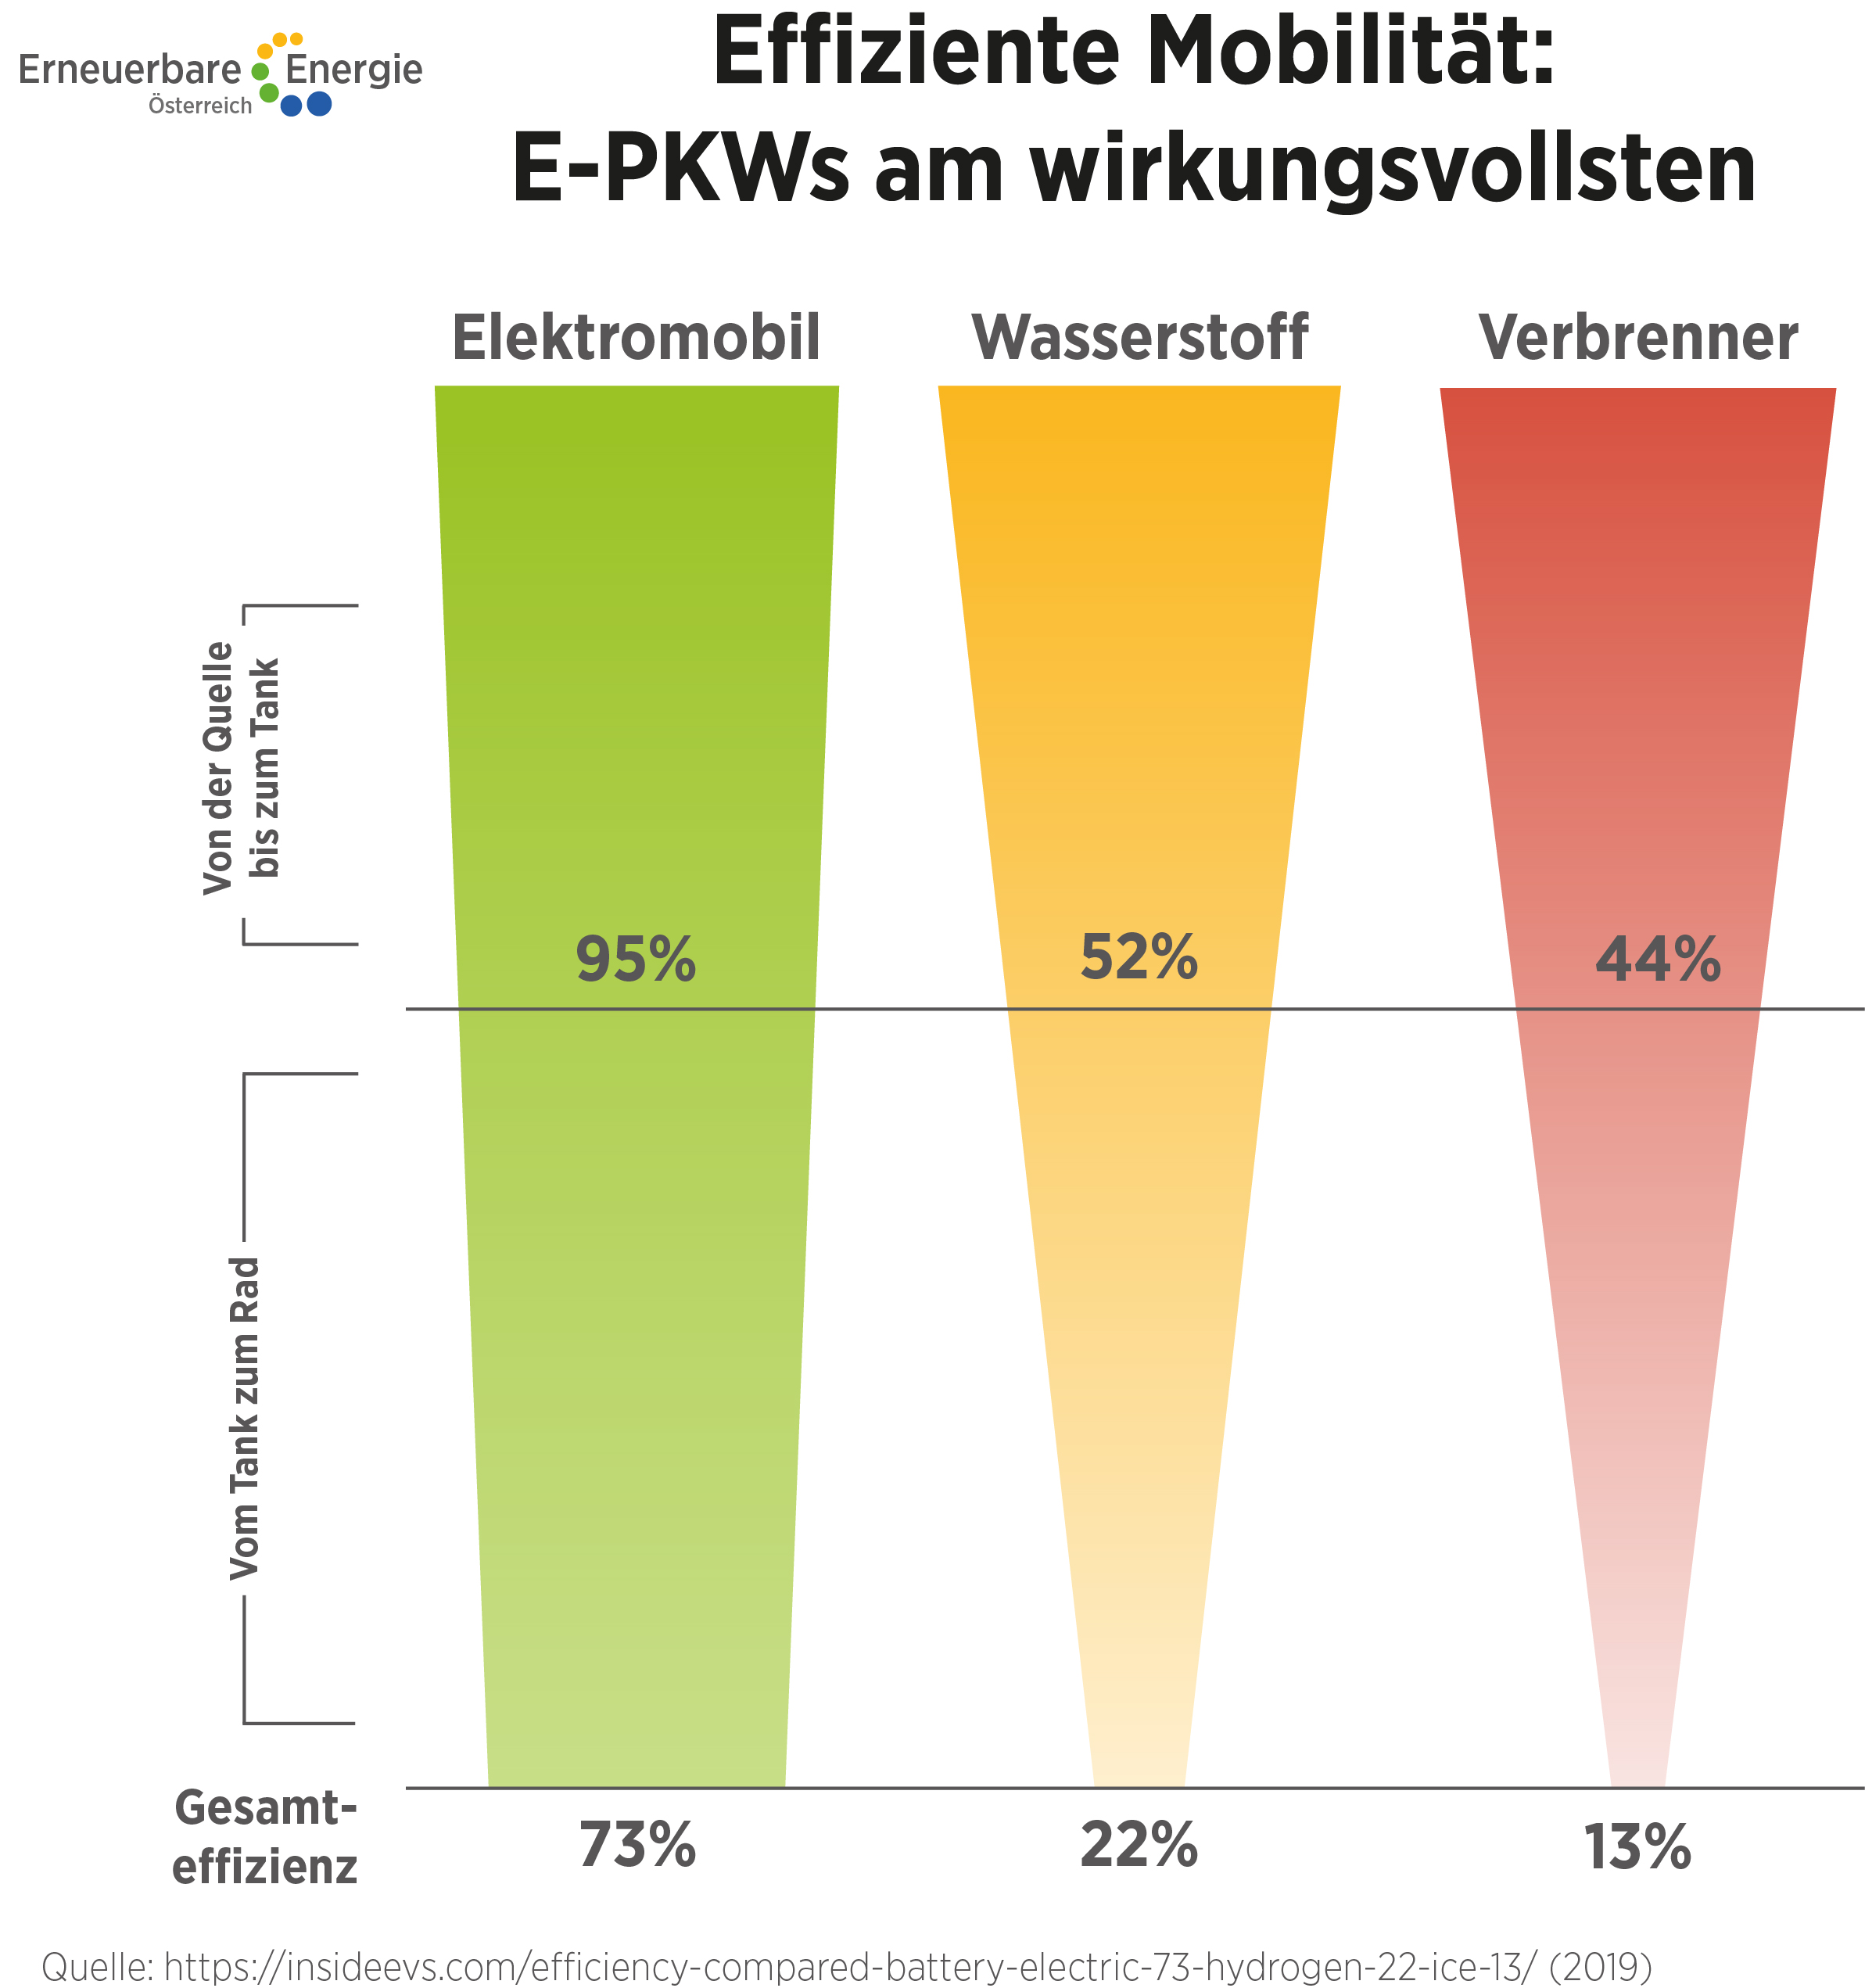 EFA5_EffizienteMobilitaet_Mobil.jpg